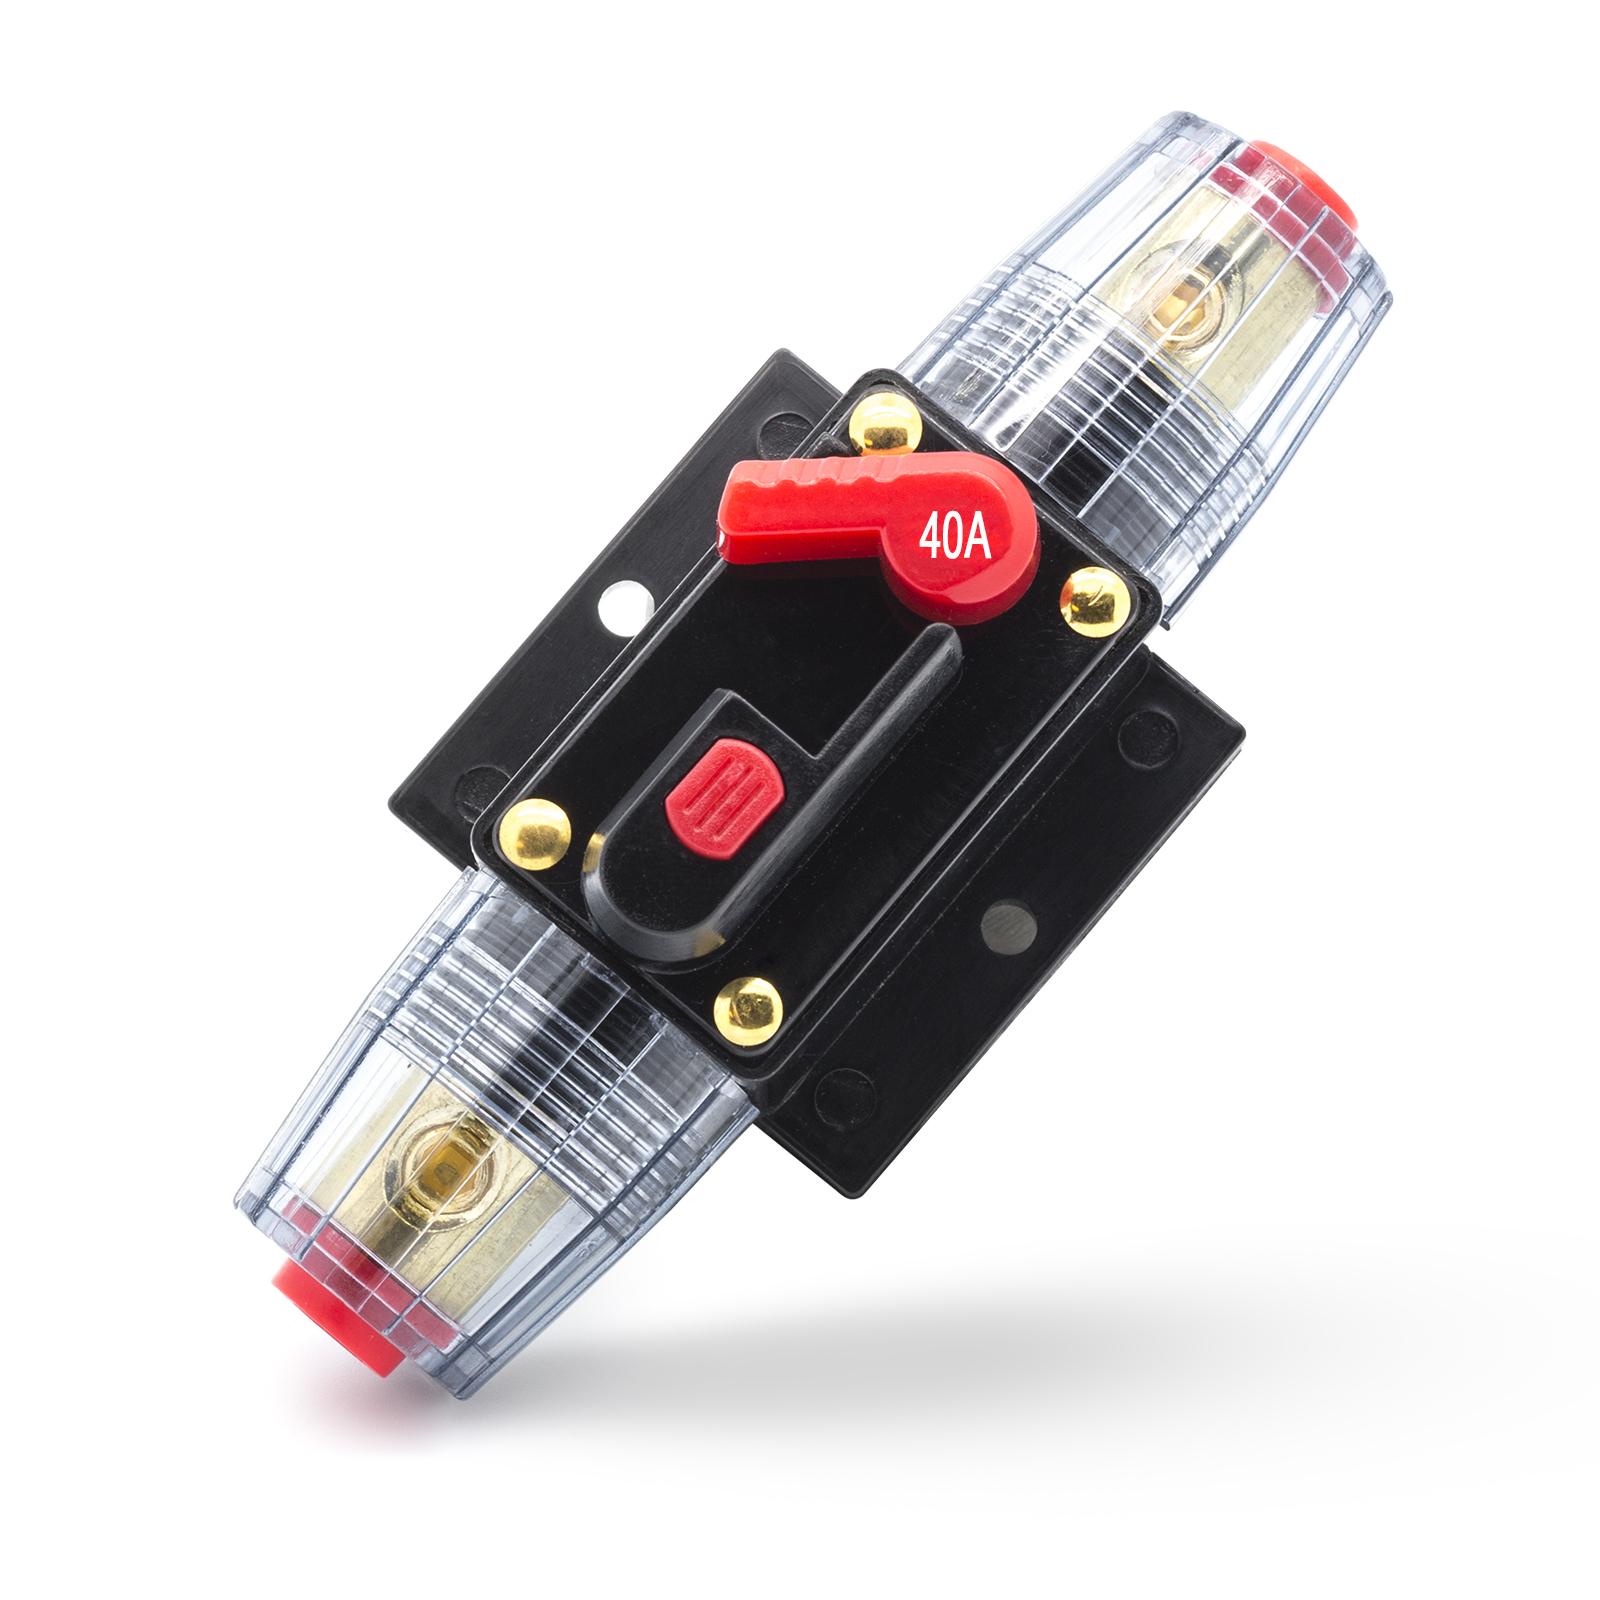 40a 100a kfz sicherung automat halter sicherungsautomat sicherungshalter 12v 24v lautsprecher. Black Bedroom Furniture Sets. Home Design Ideas